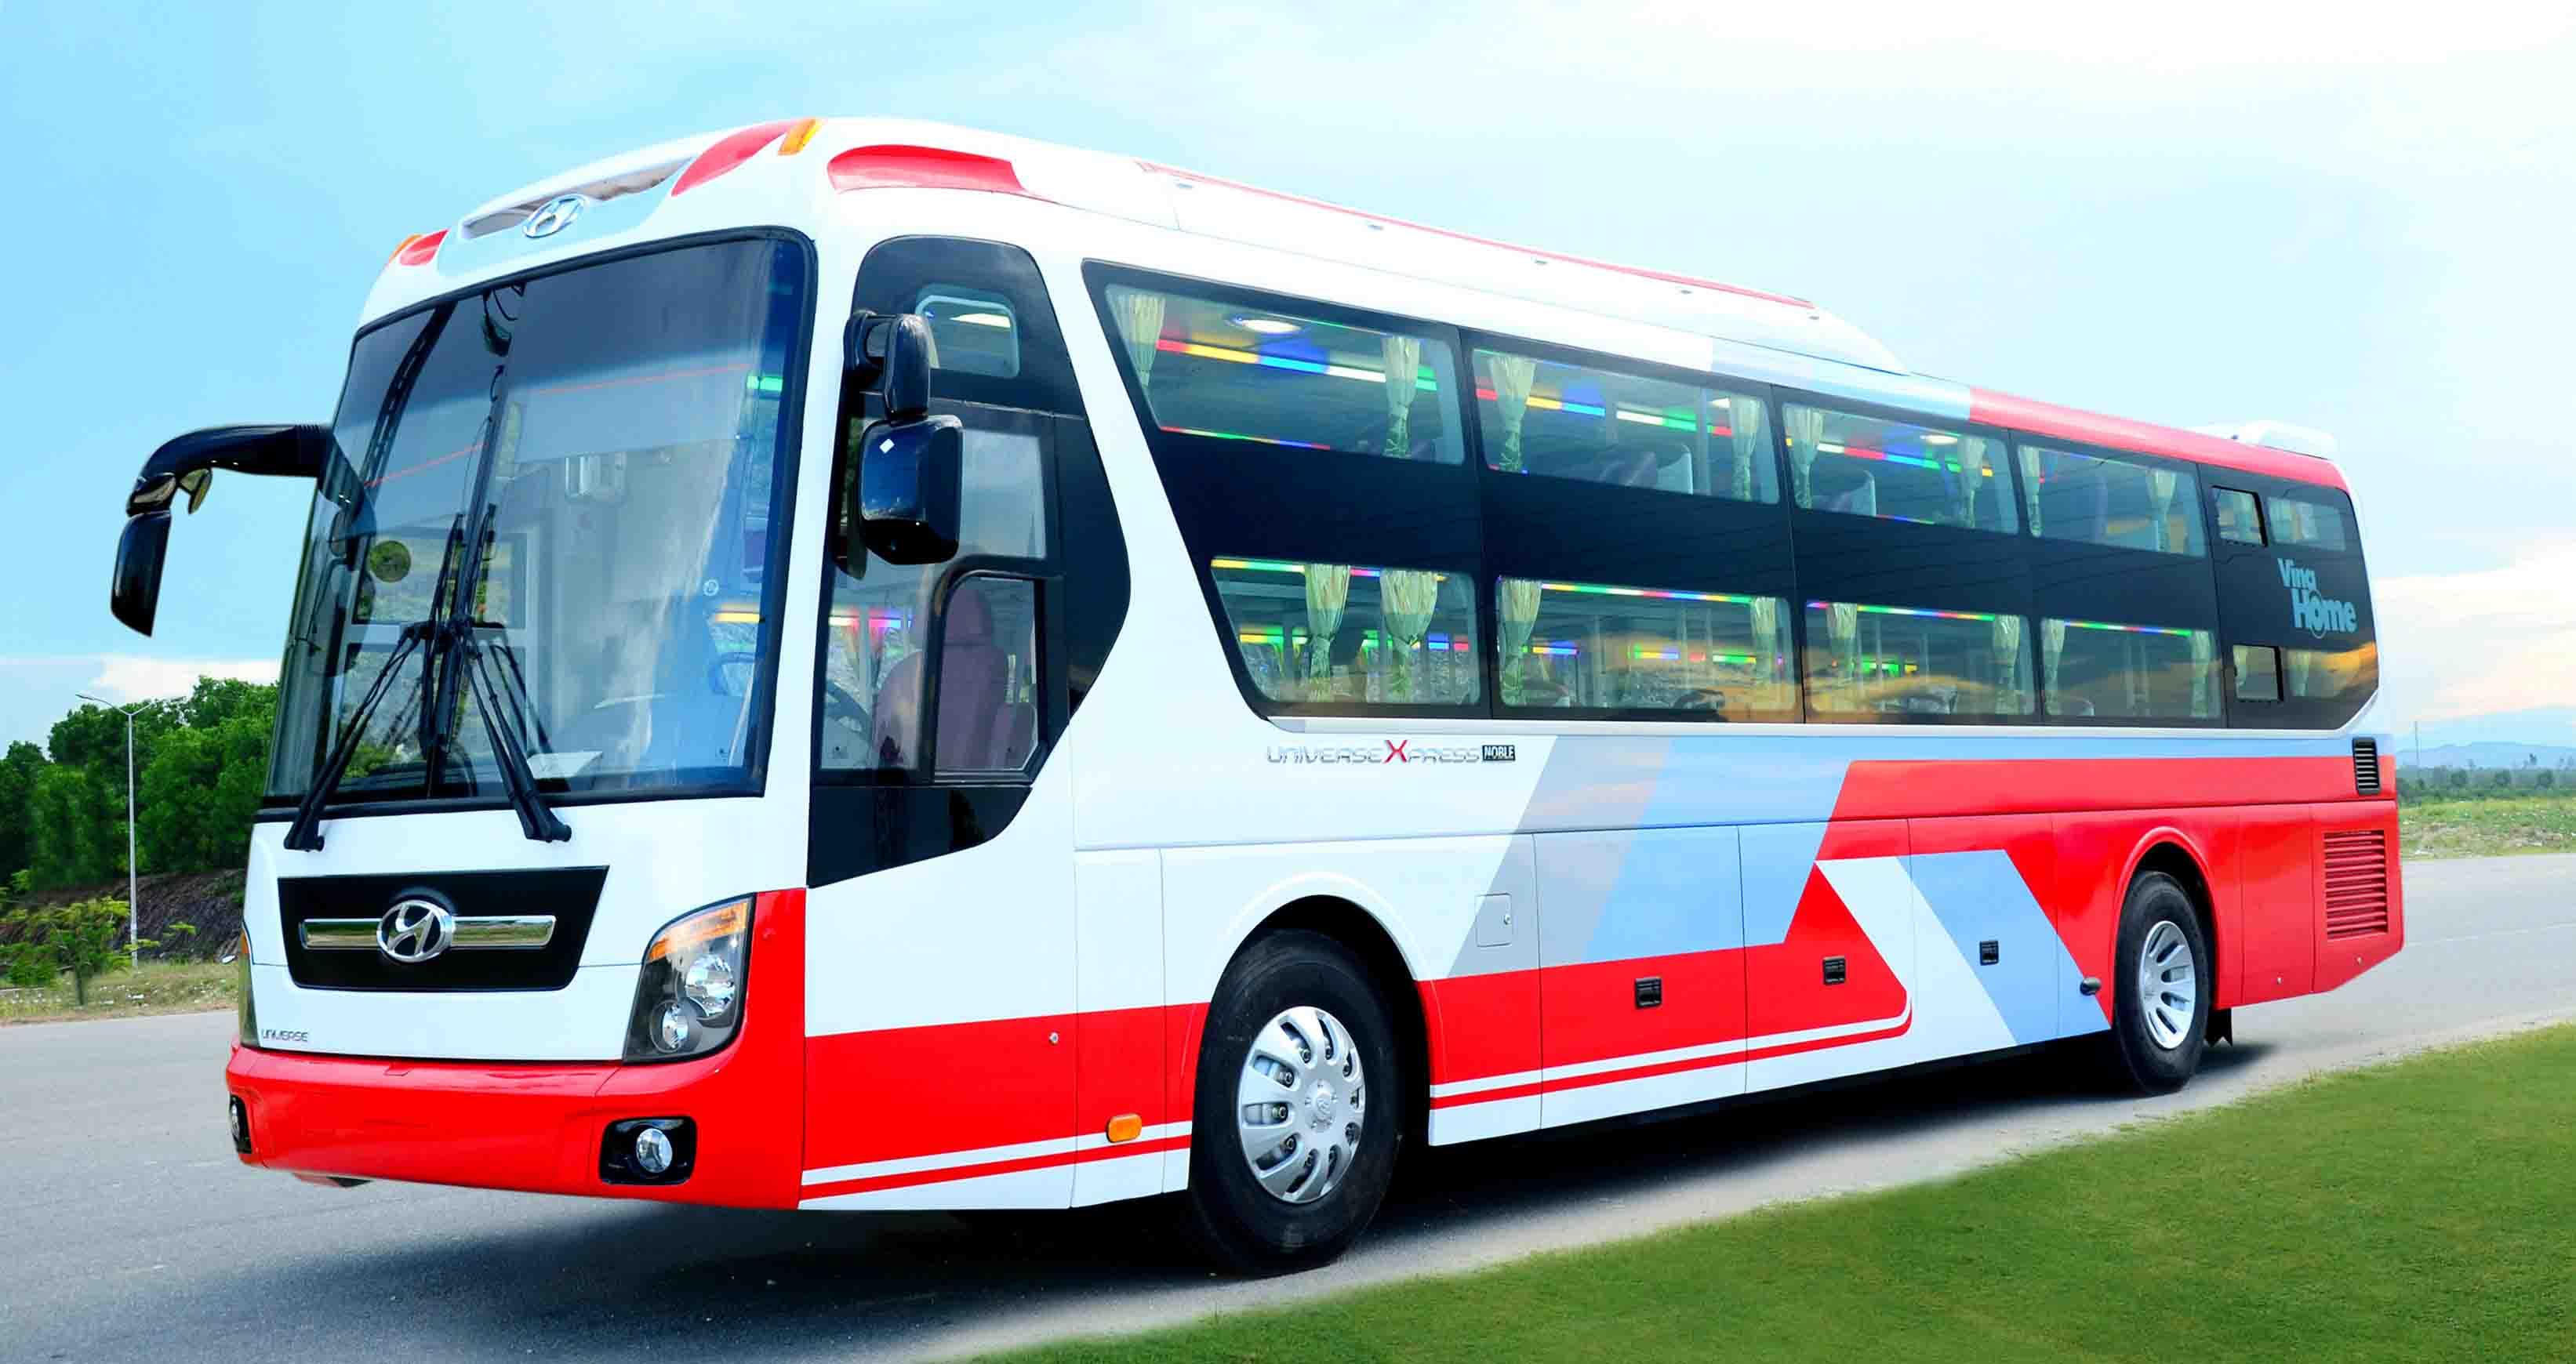 Xe open bus, open tour chất lượng cao Huế đi Đồng Hới